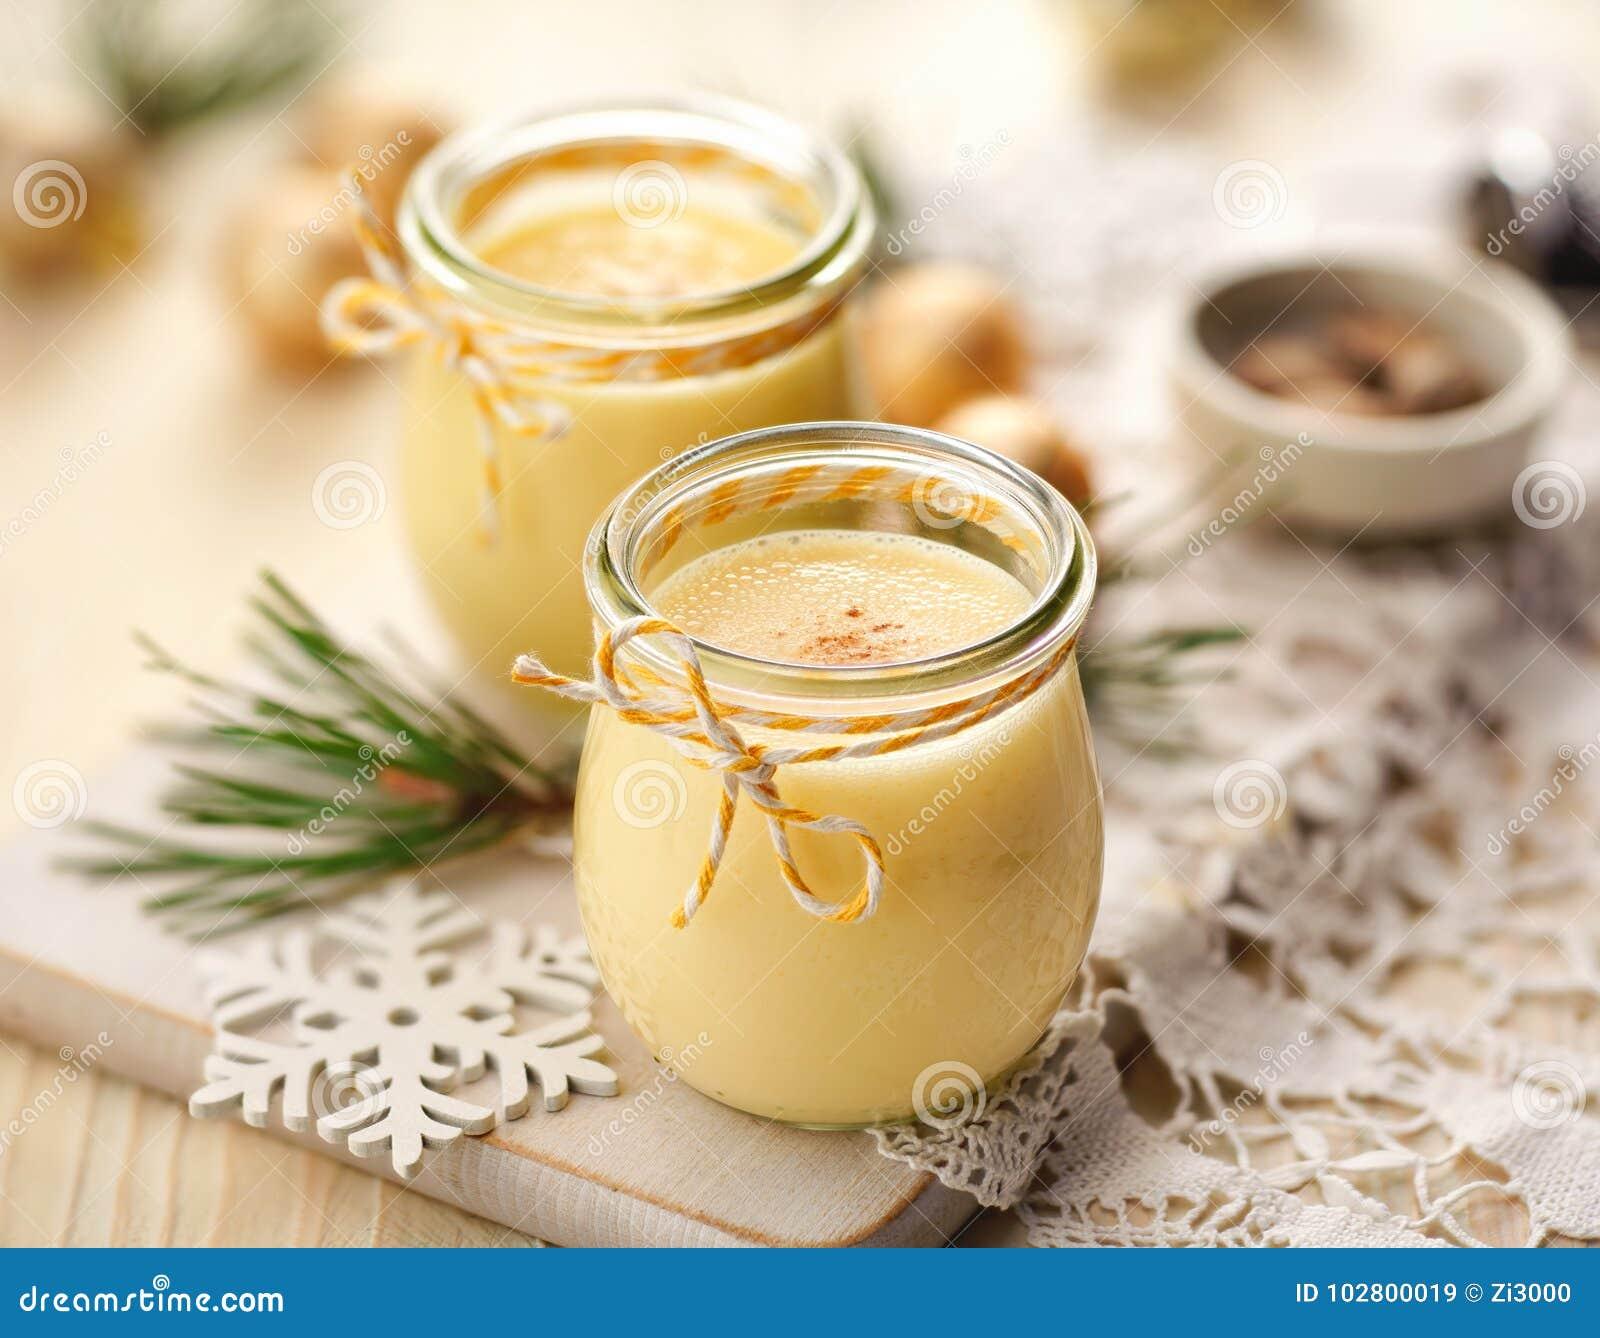 Eggnog Alcoholic Beverage Served With Cinnamon Or Nutmeg